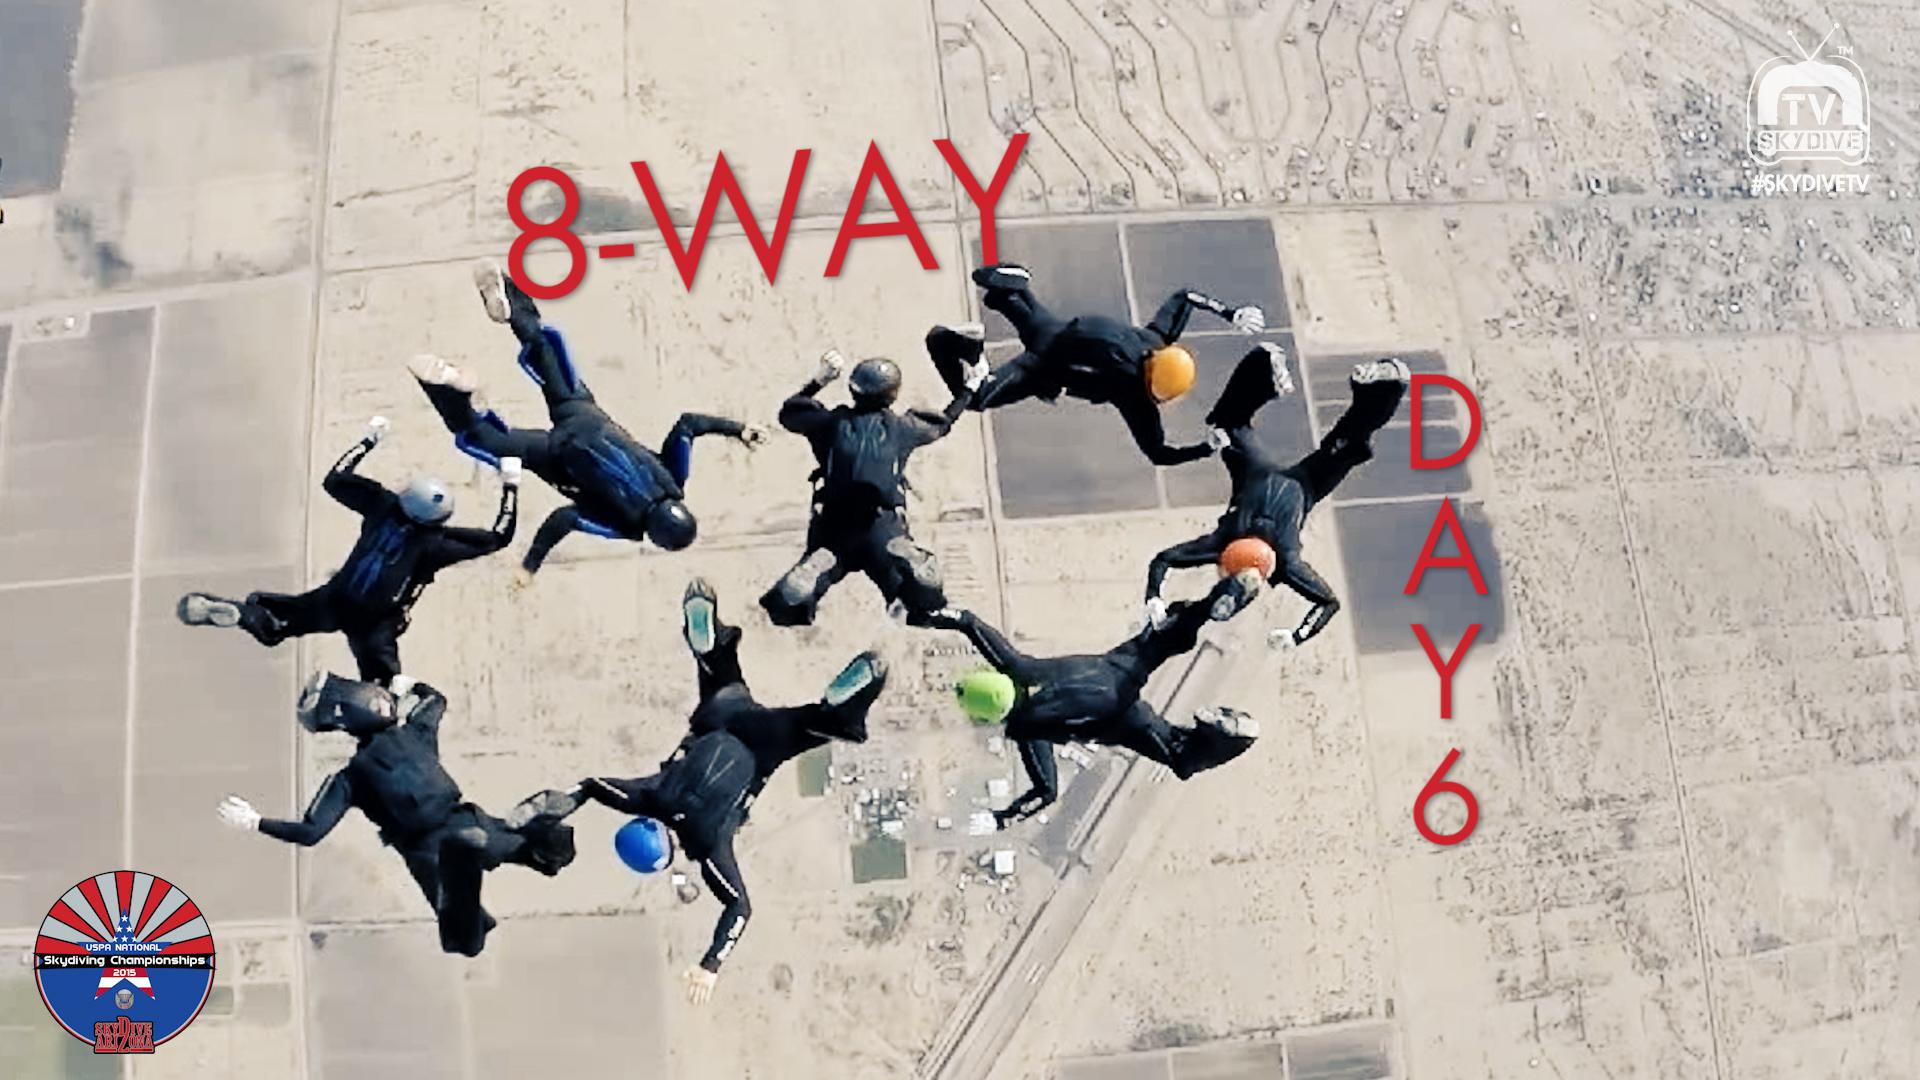 DAY6-8 way